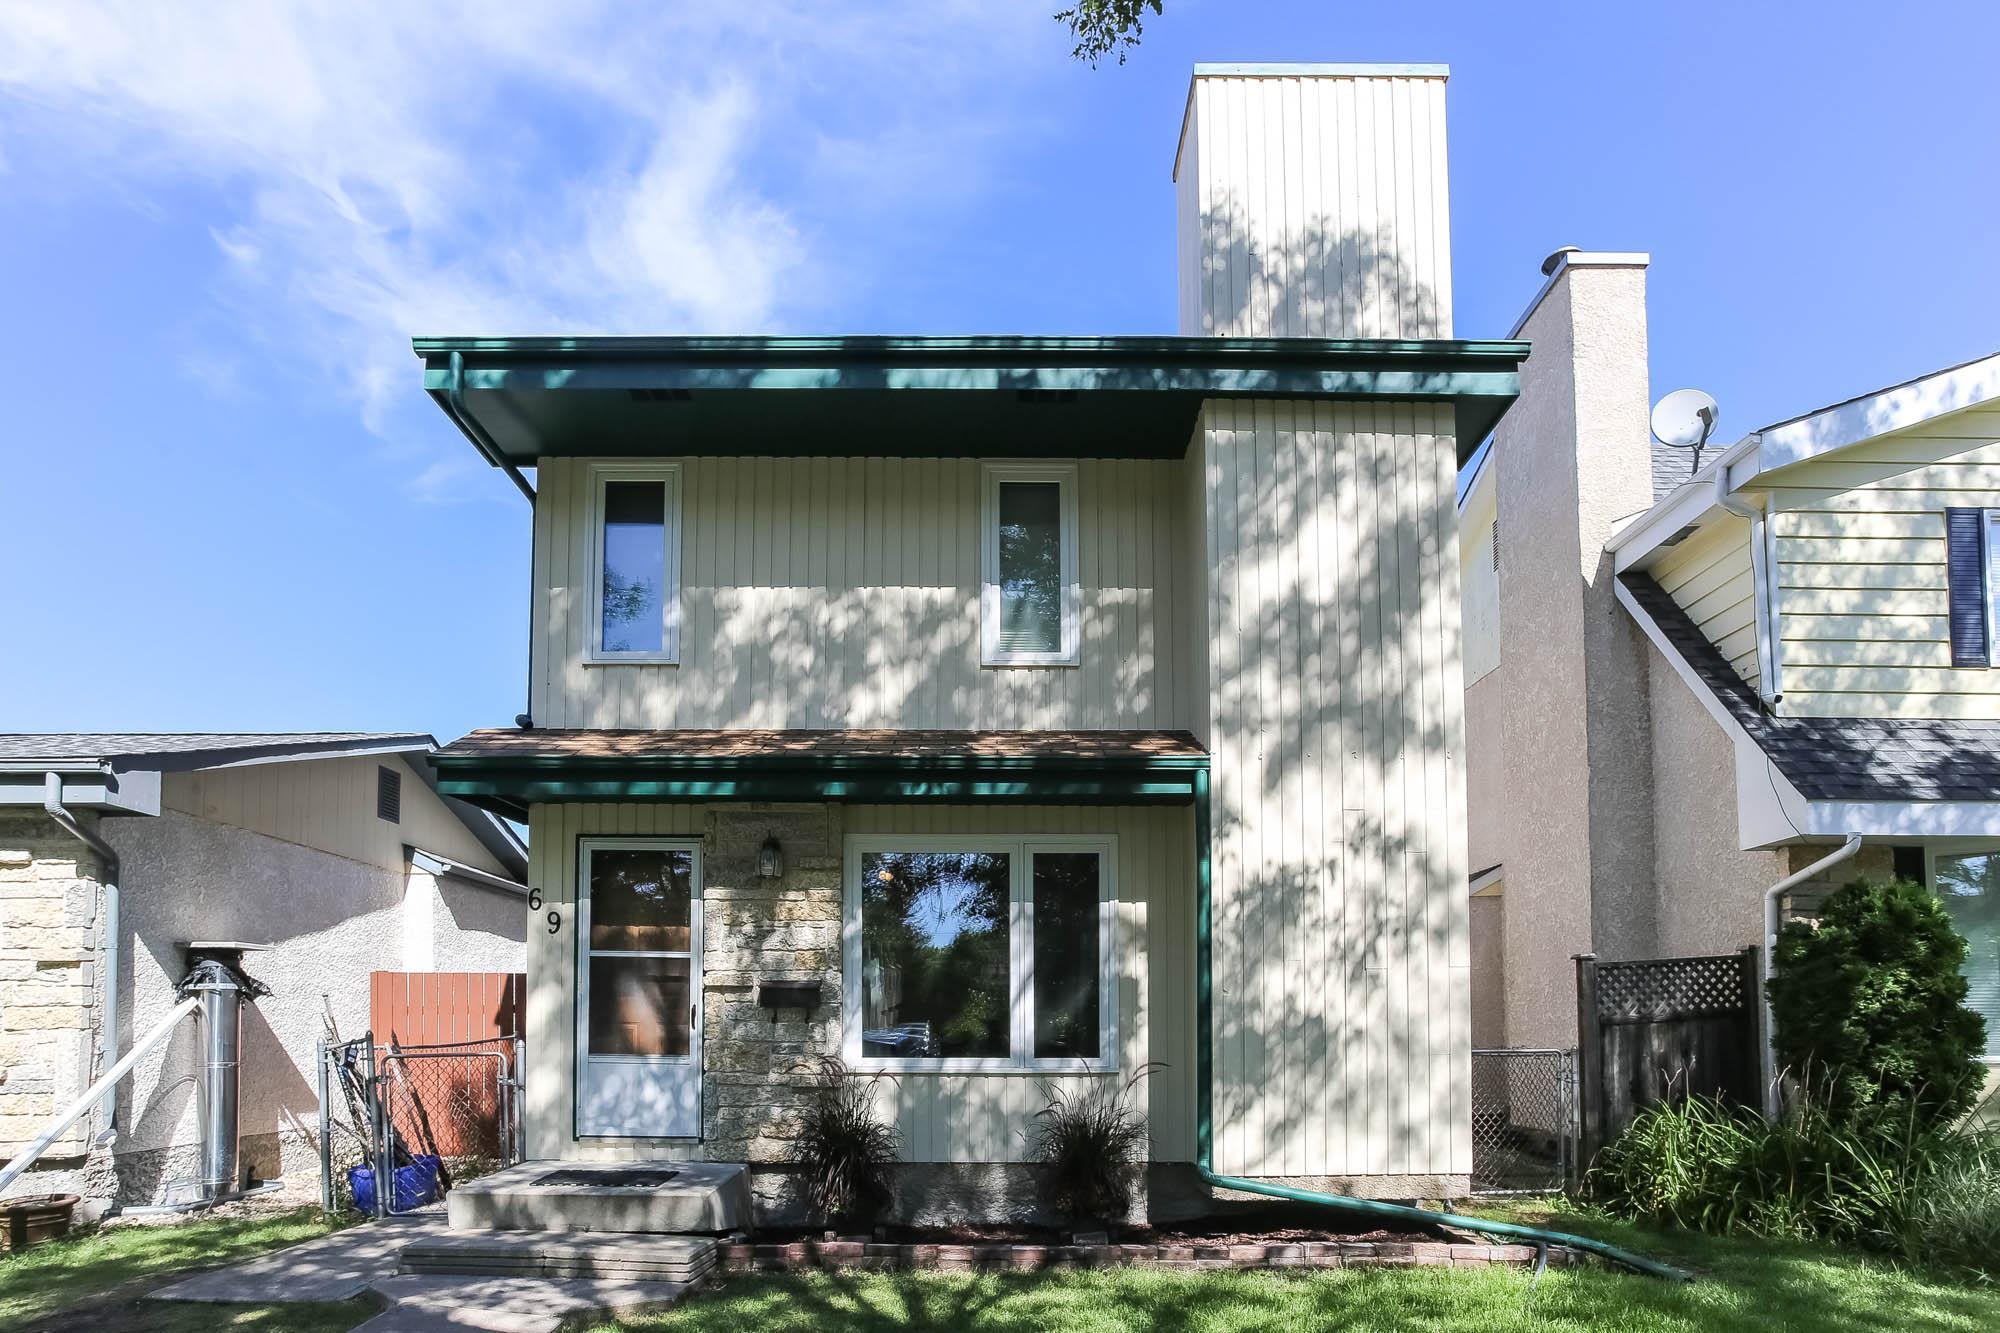 69 Carriage House Road, Winnipeg, Manitoba  R2N 2J5 - Photo 28 - 202020700